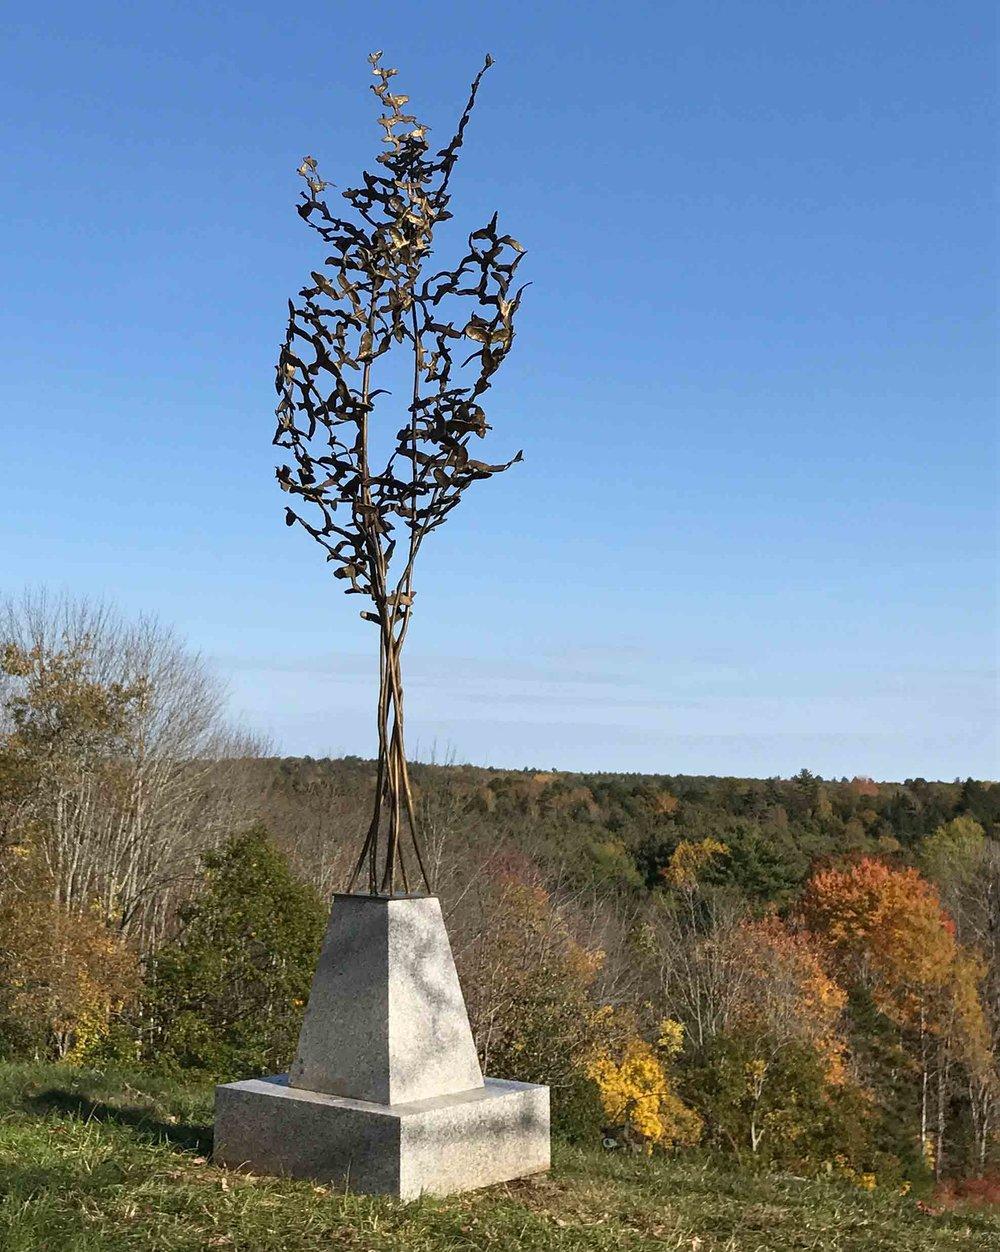 Millesimes, 11' x 4' x 4', Unique Bronze on Granite Base, $45,000